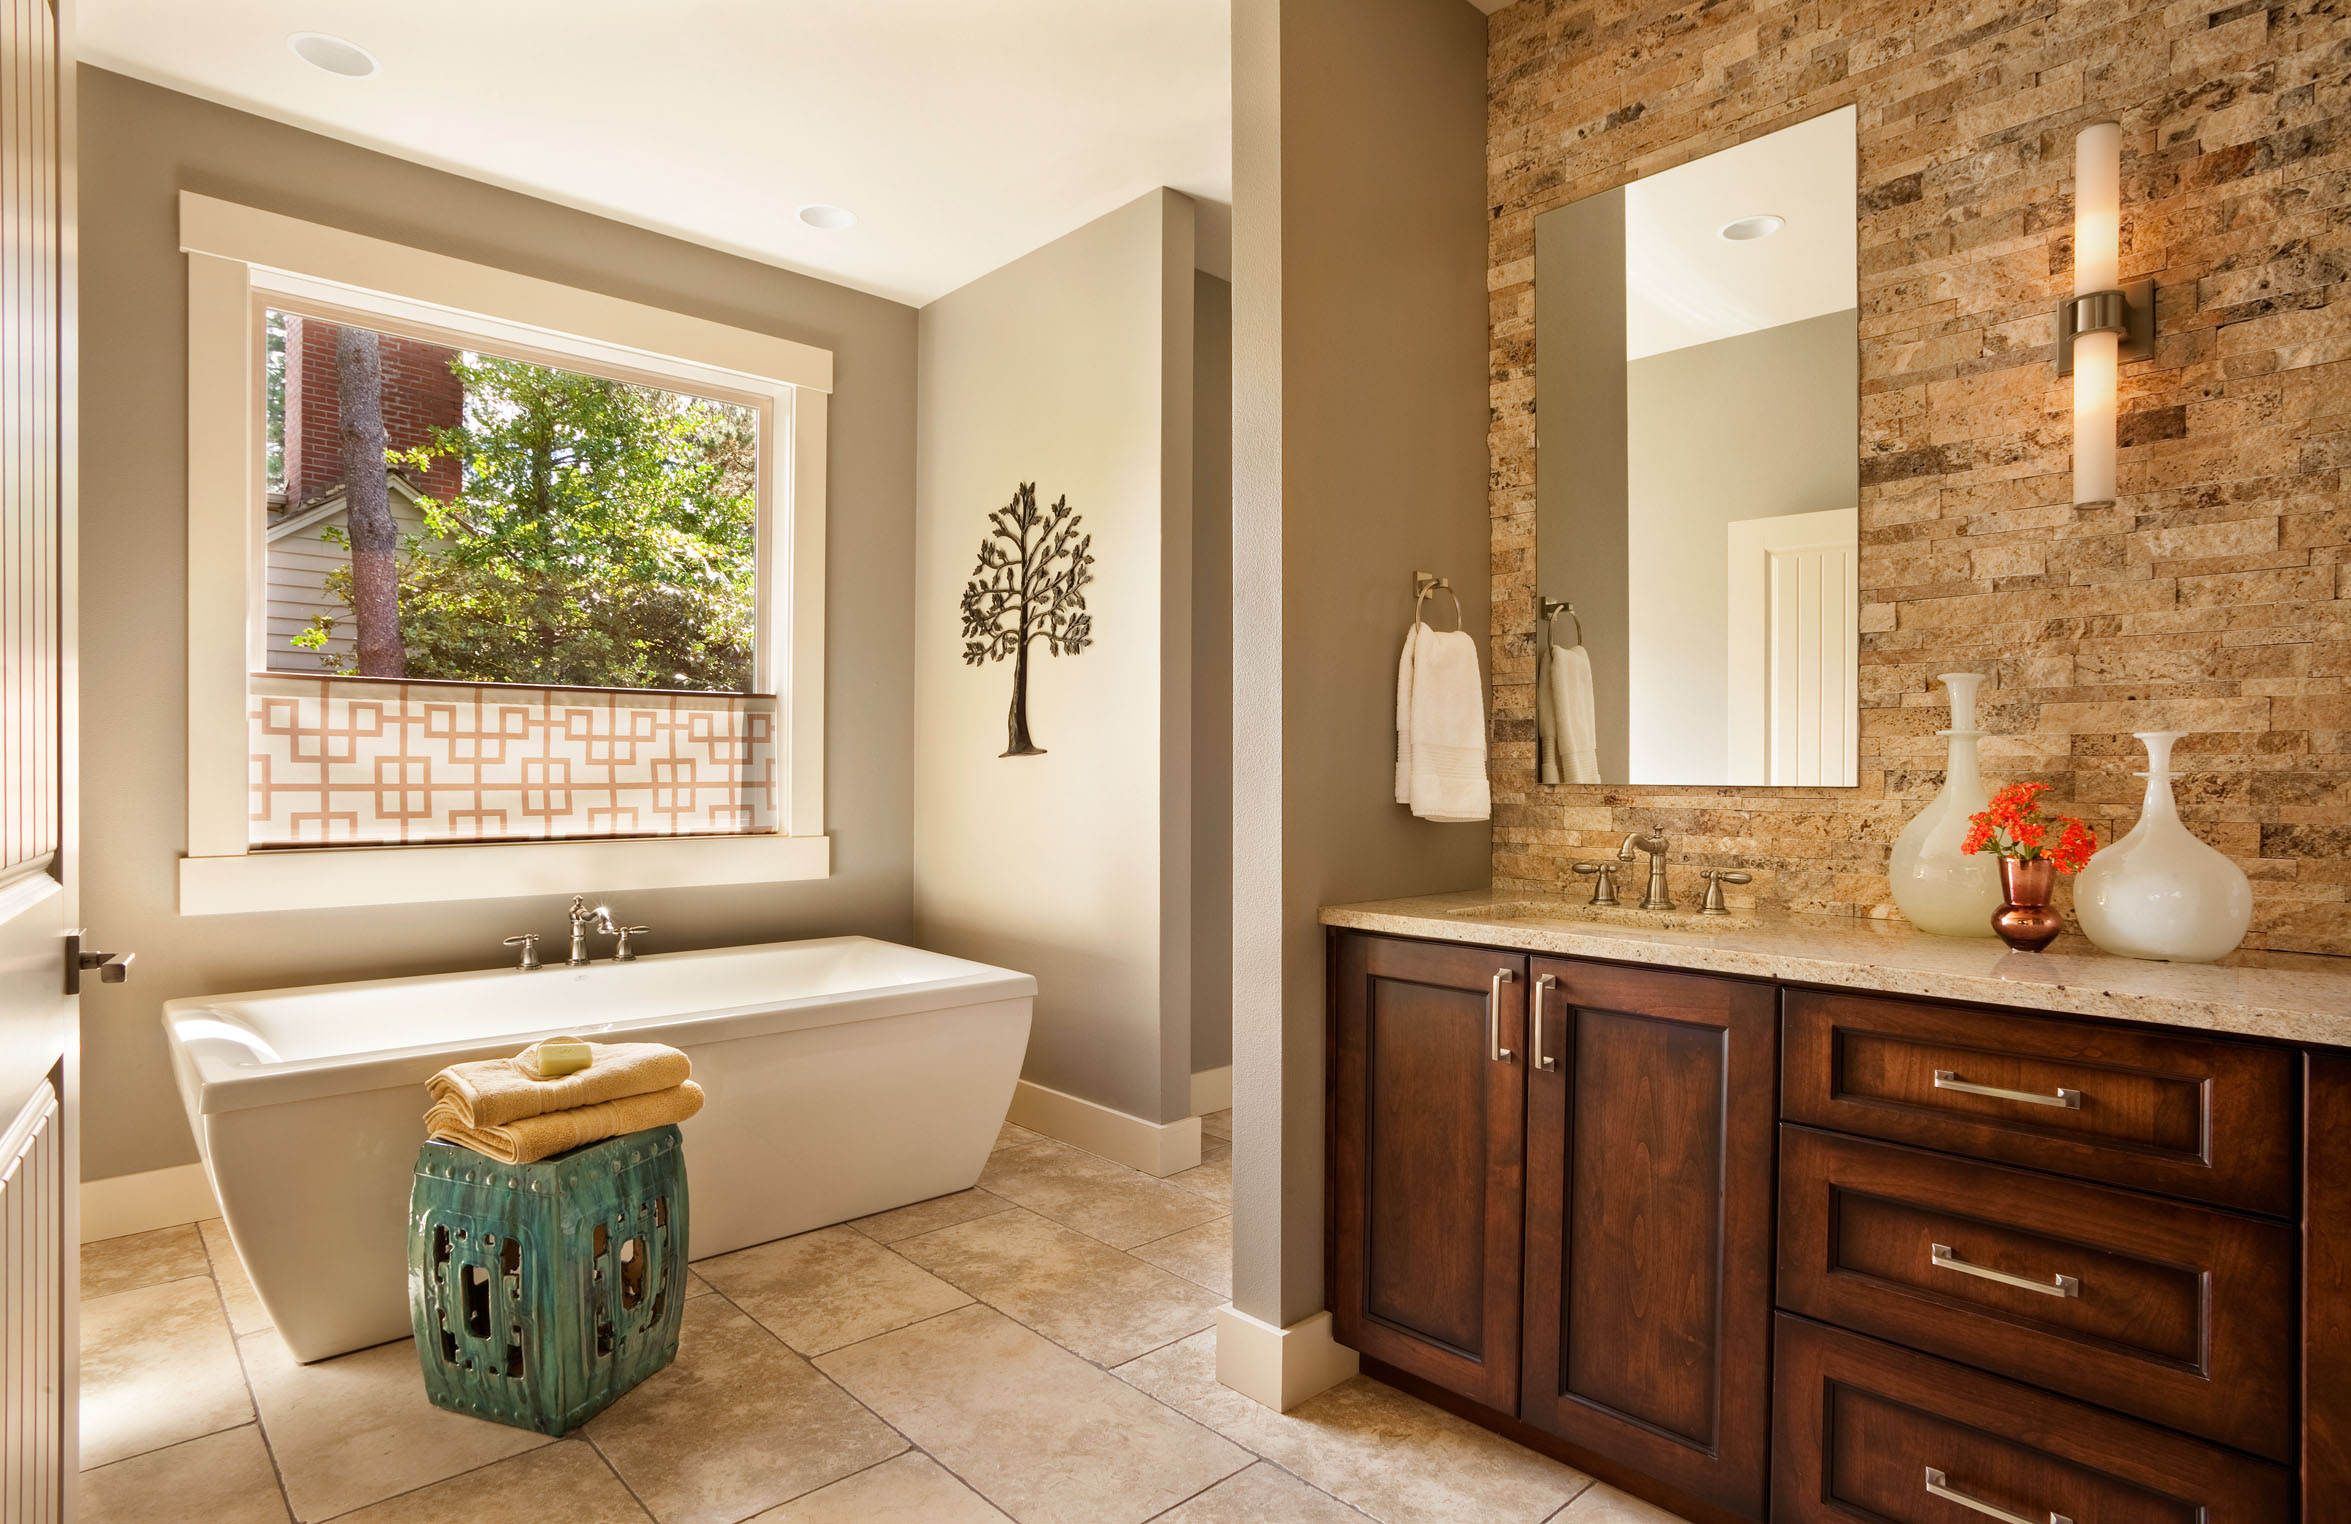 Best Images About Bathroom On Pinterest Bathroom Vanity - Spa like bathrooms